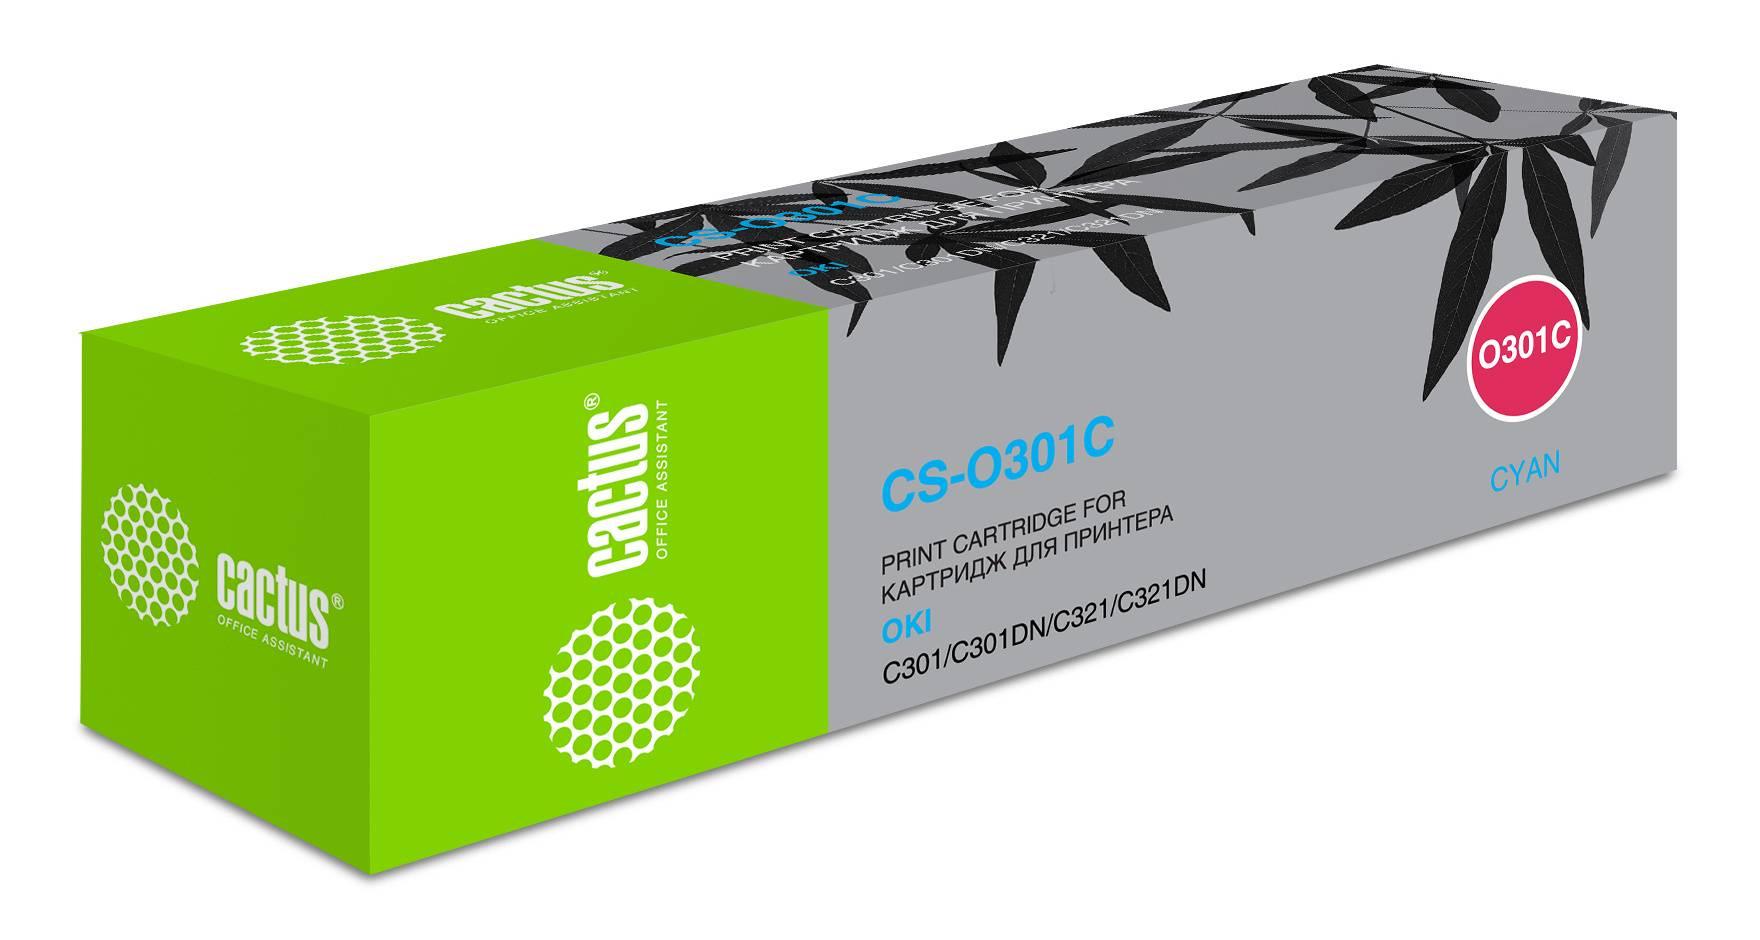 Тонер Картридж Cactus 44973543 CS-O301C голубой - фото 1